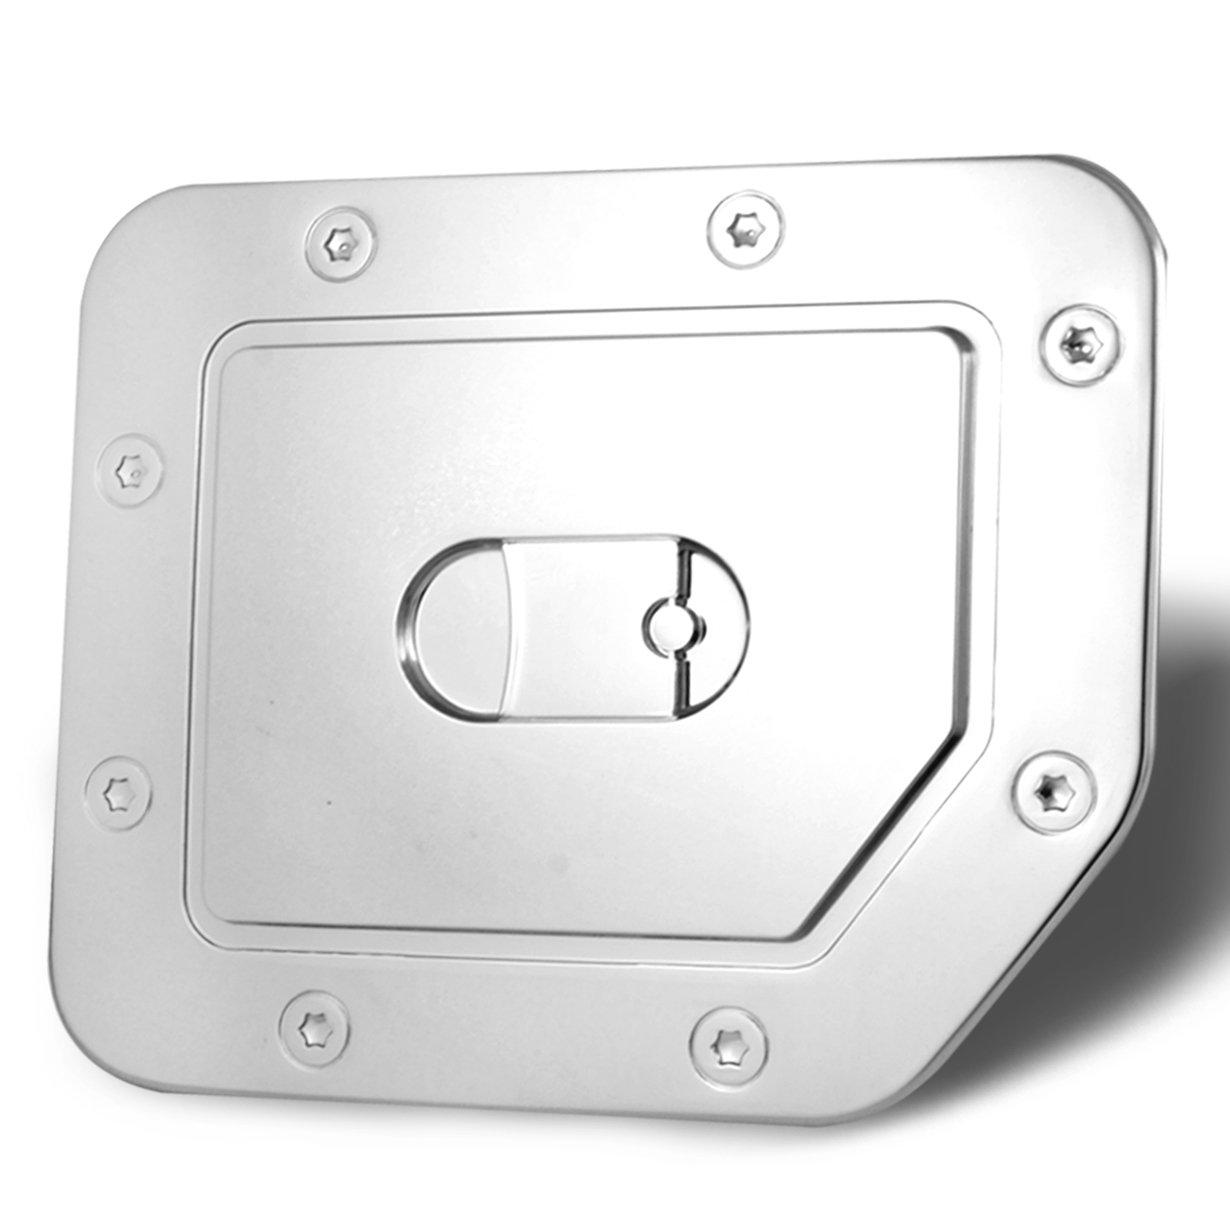 AutoModZone Chrome ABS Fuel Tank Gas Door Cap Cover for 04-15 Nissan Titan